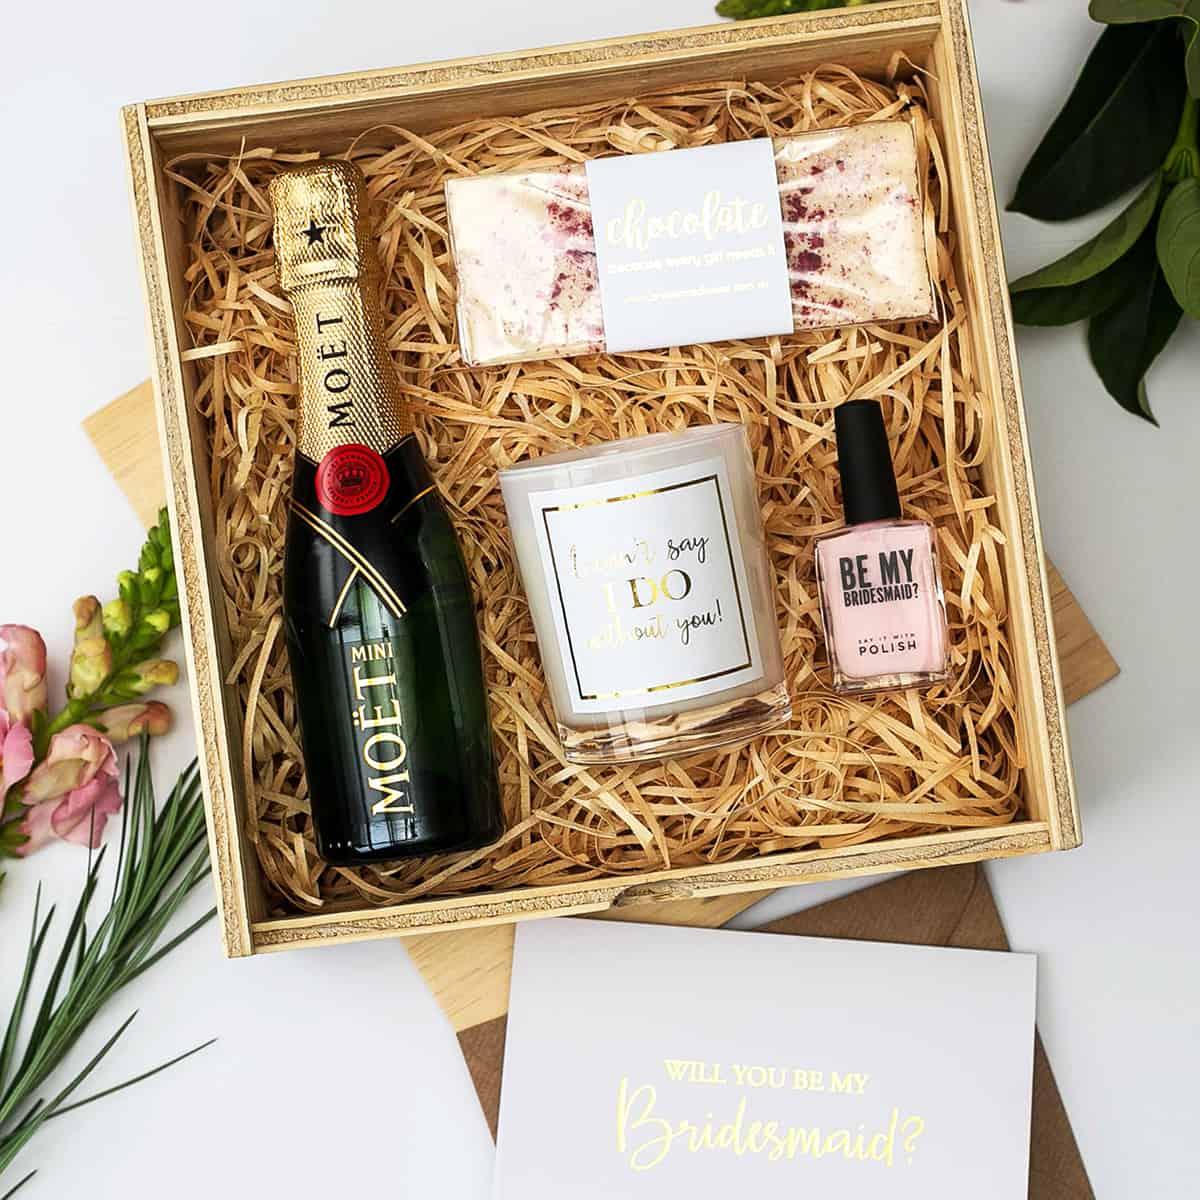 Be-My-Bridesmaid-Gift-Hamper